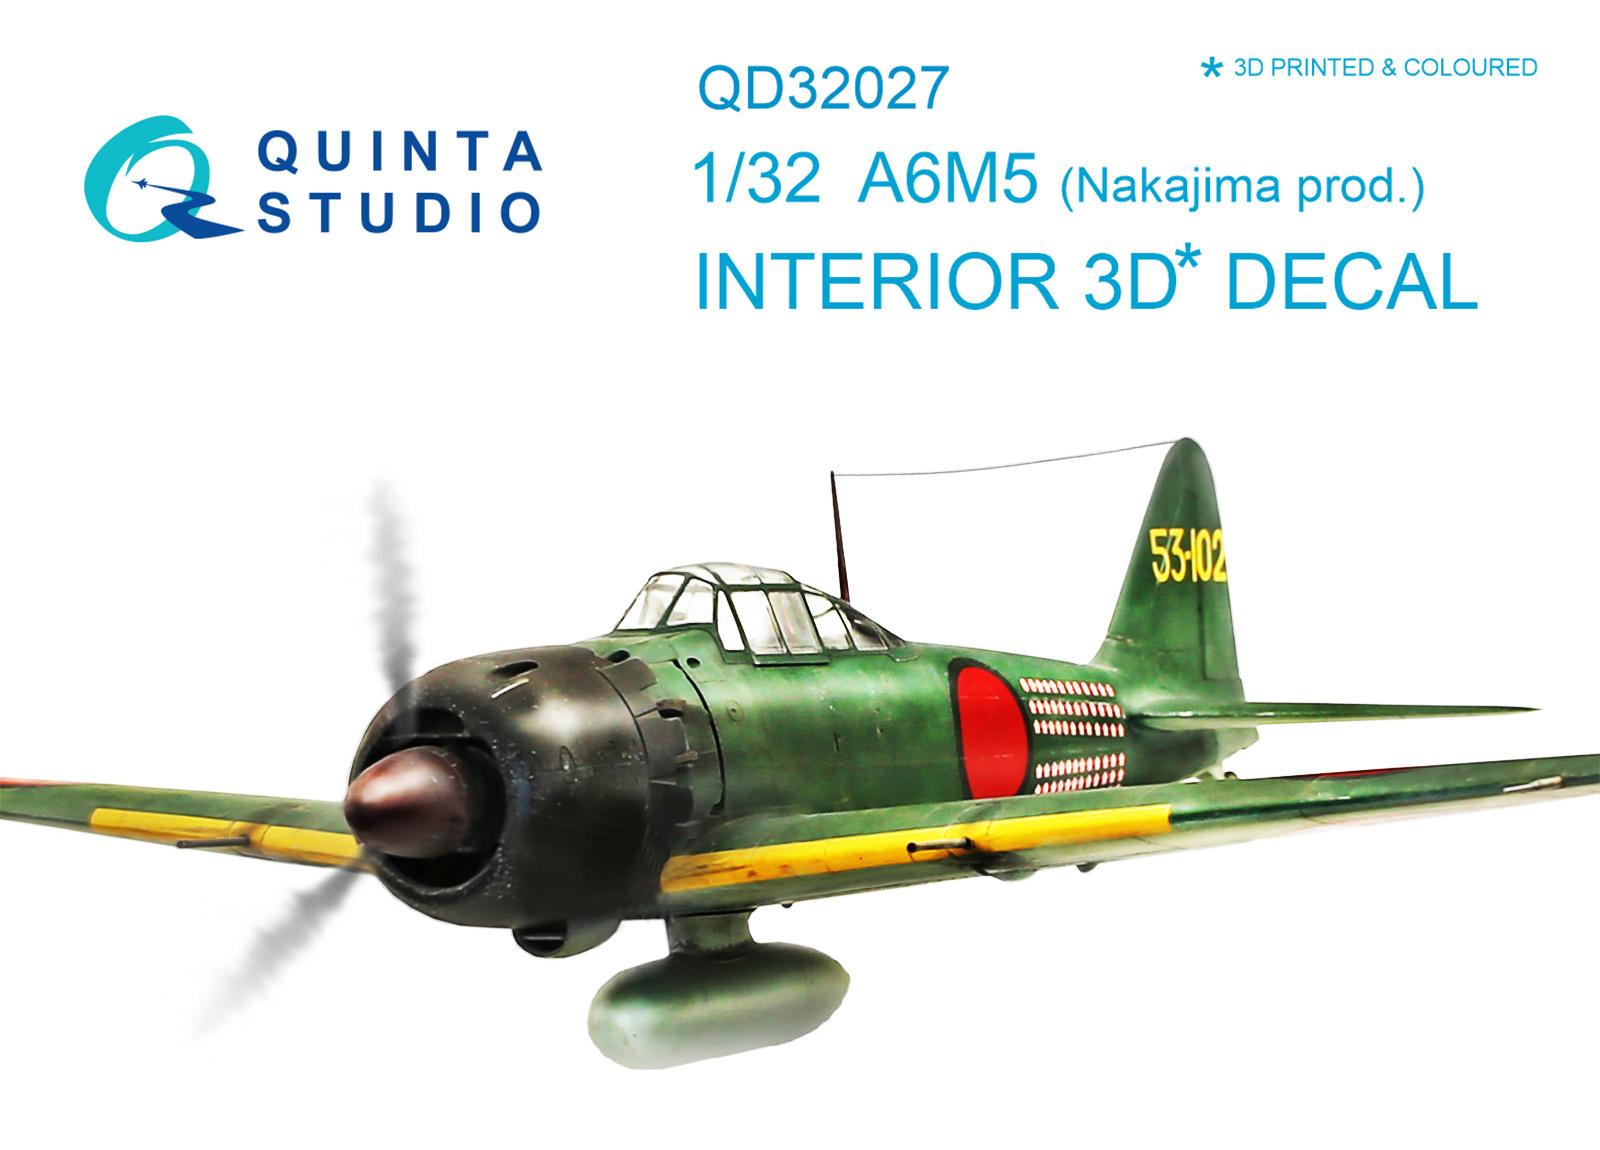 QD32027